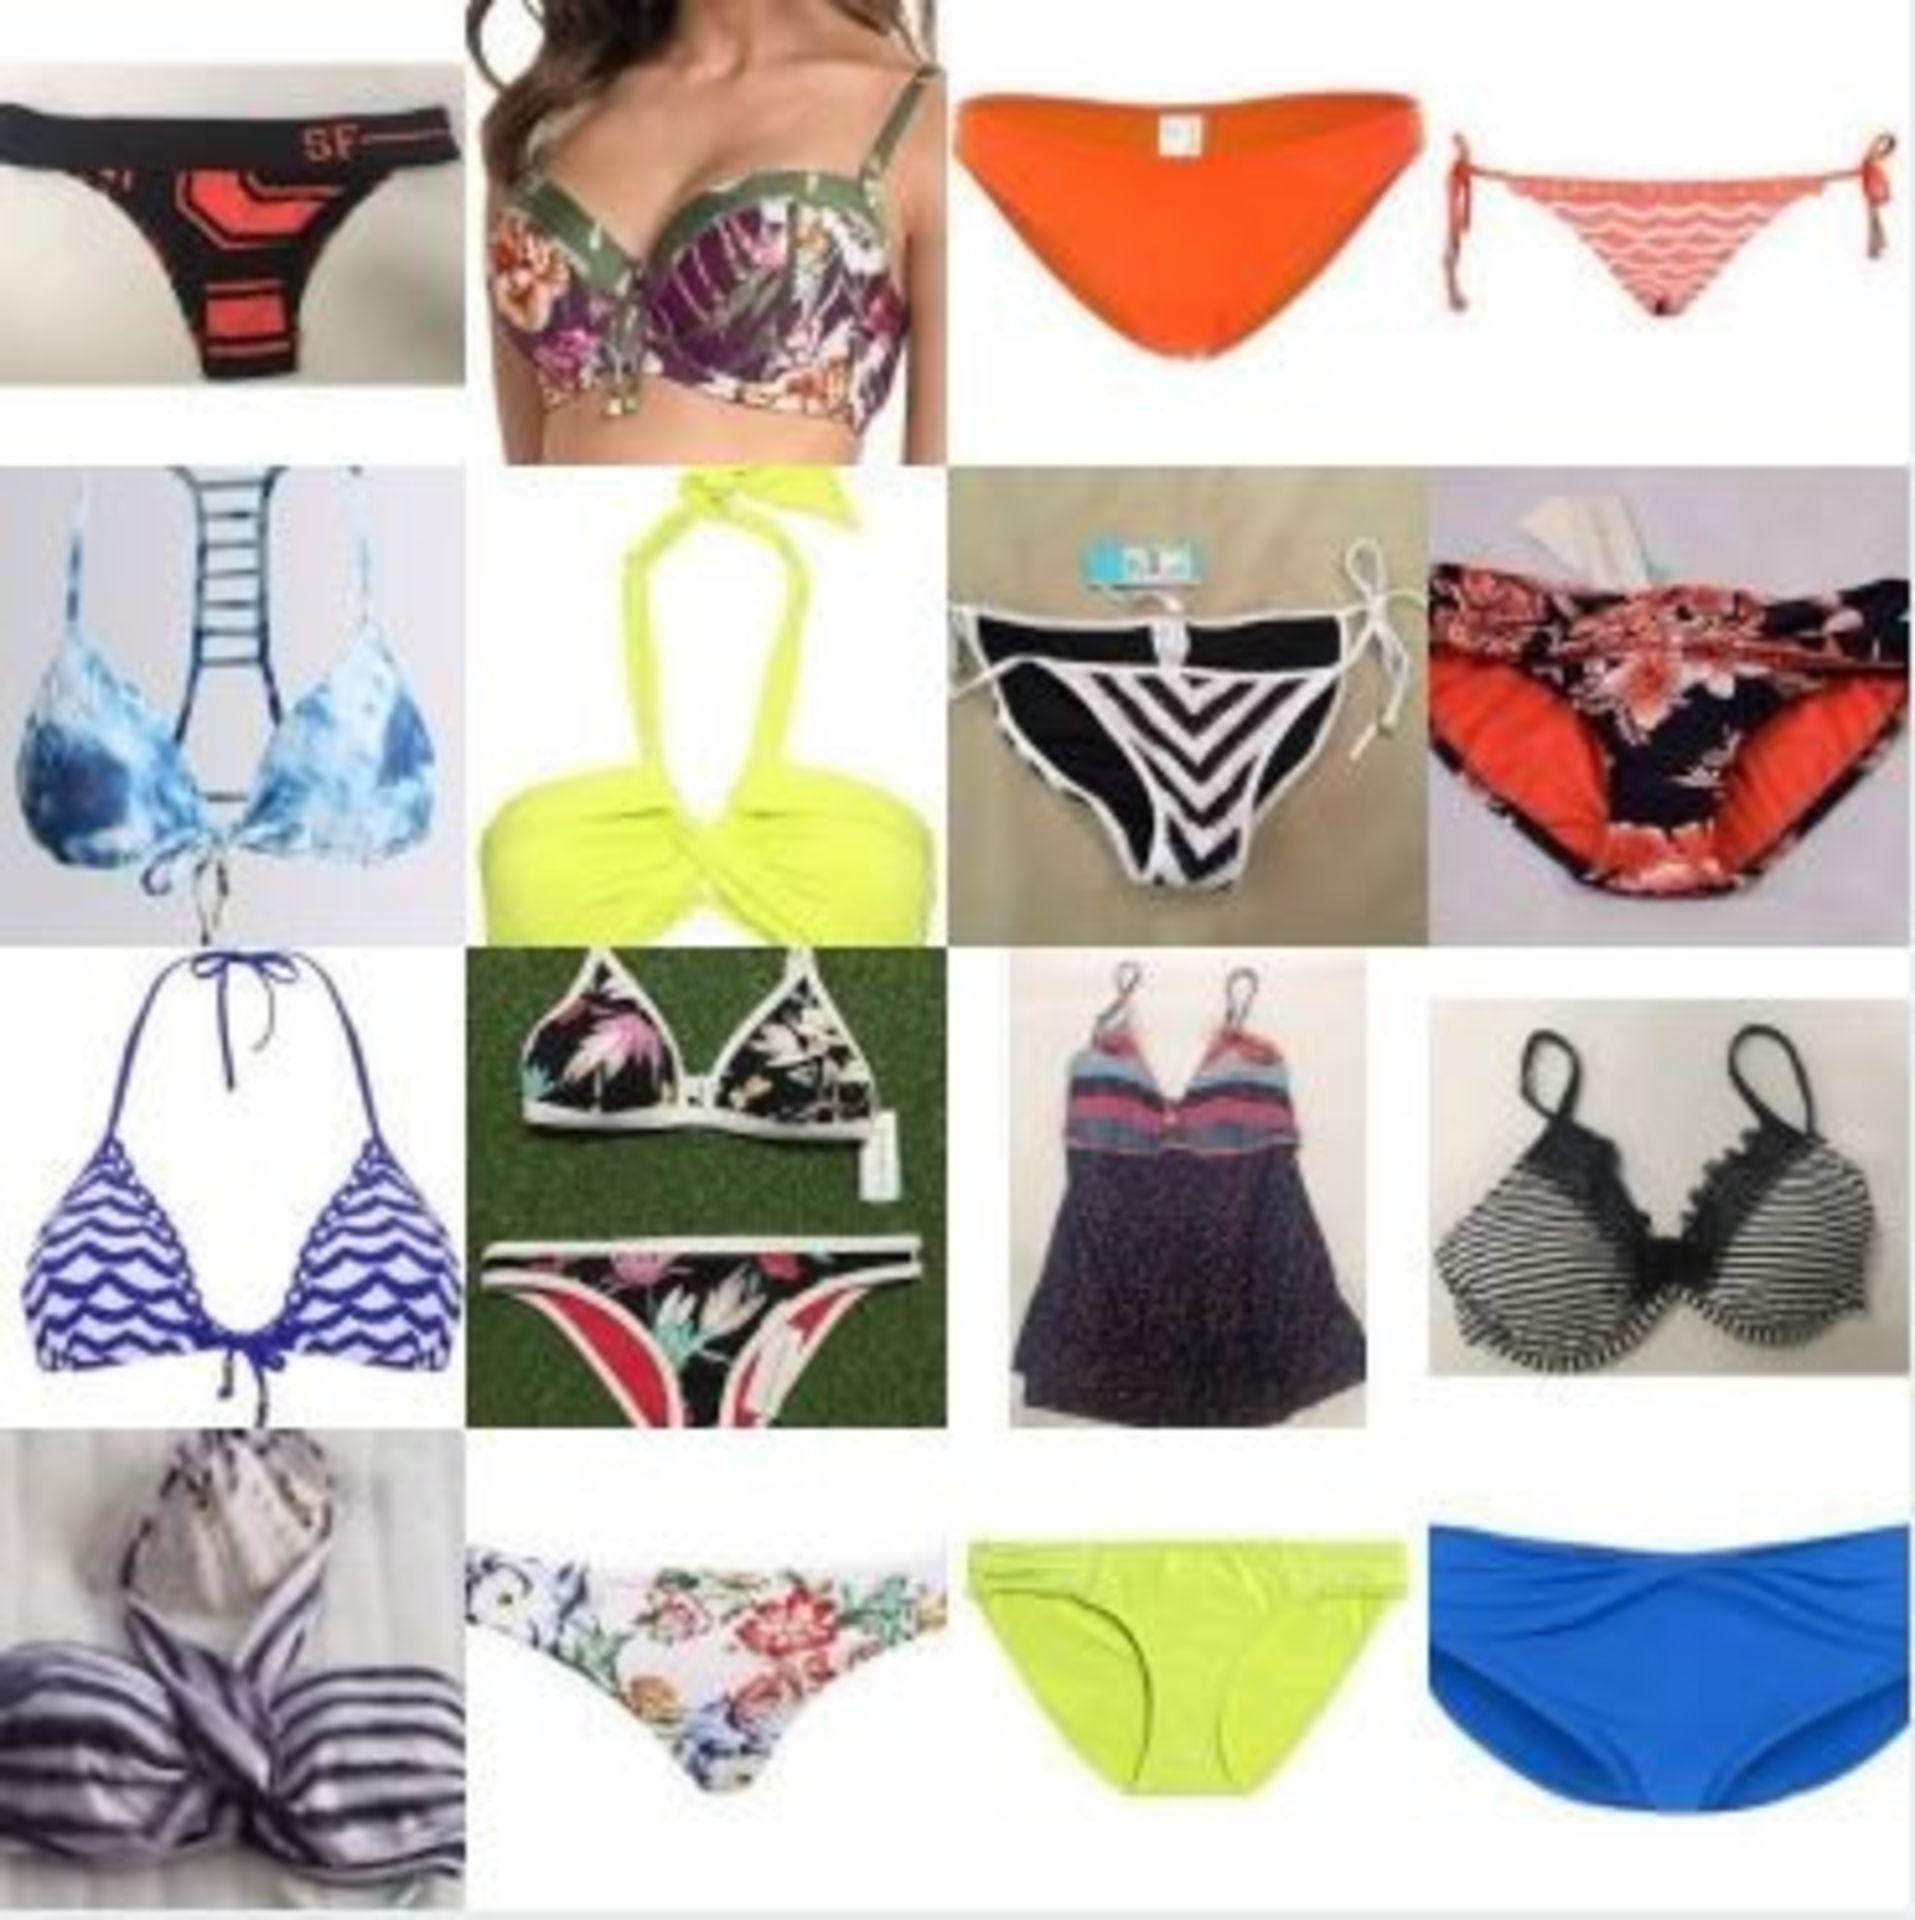 Lot 26 - Sourced From Big Brand Bikini Manufacturer SeaFolly: